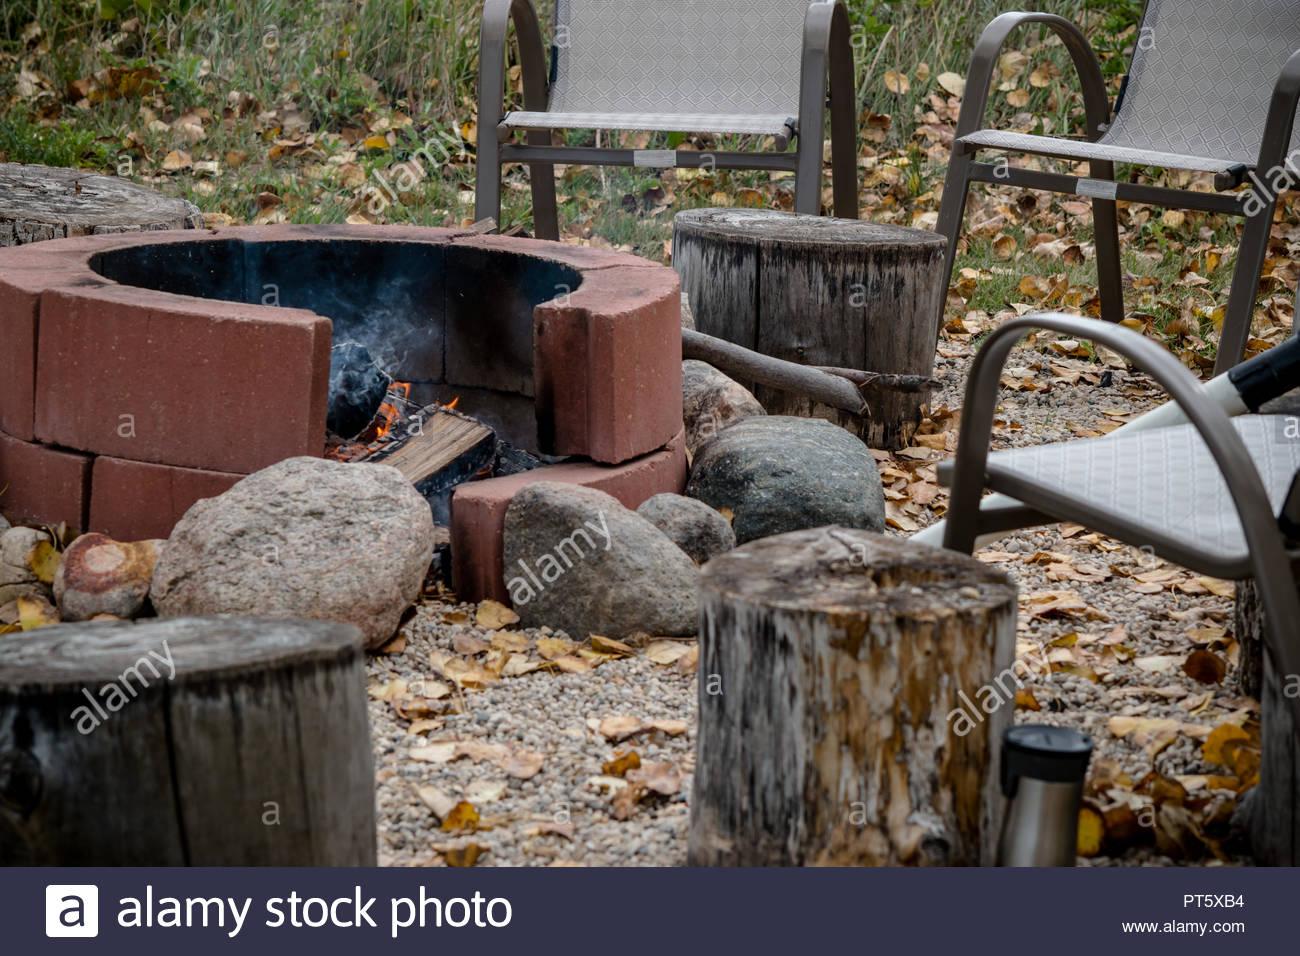 A Brick Fire Pit In A Canadian Backyard Stock Photo 221406616 Alamy